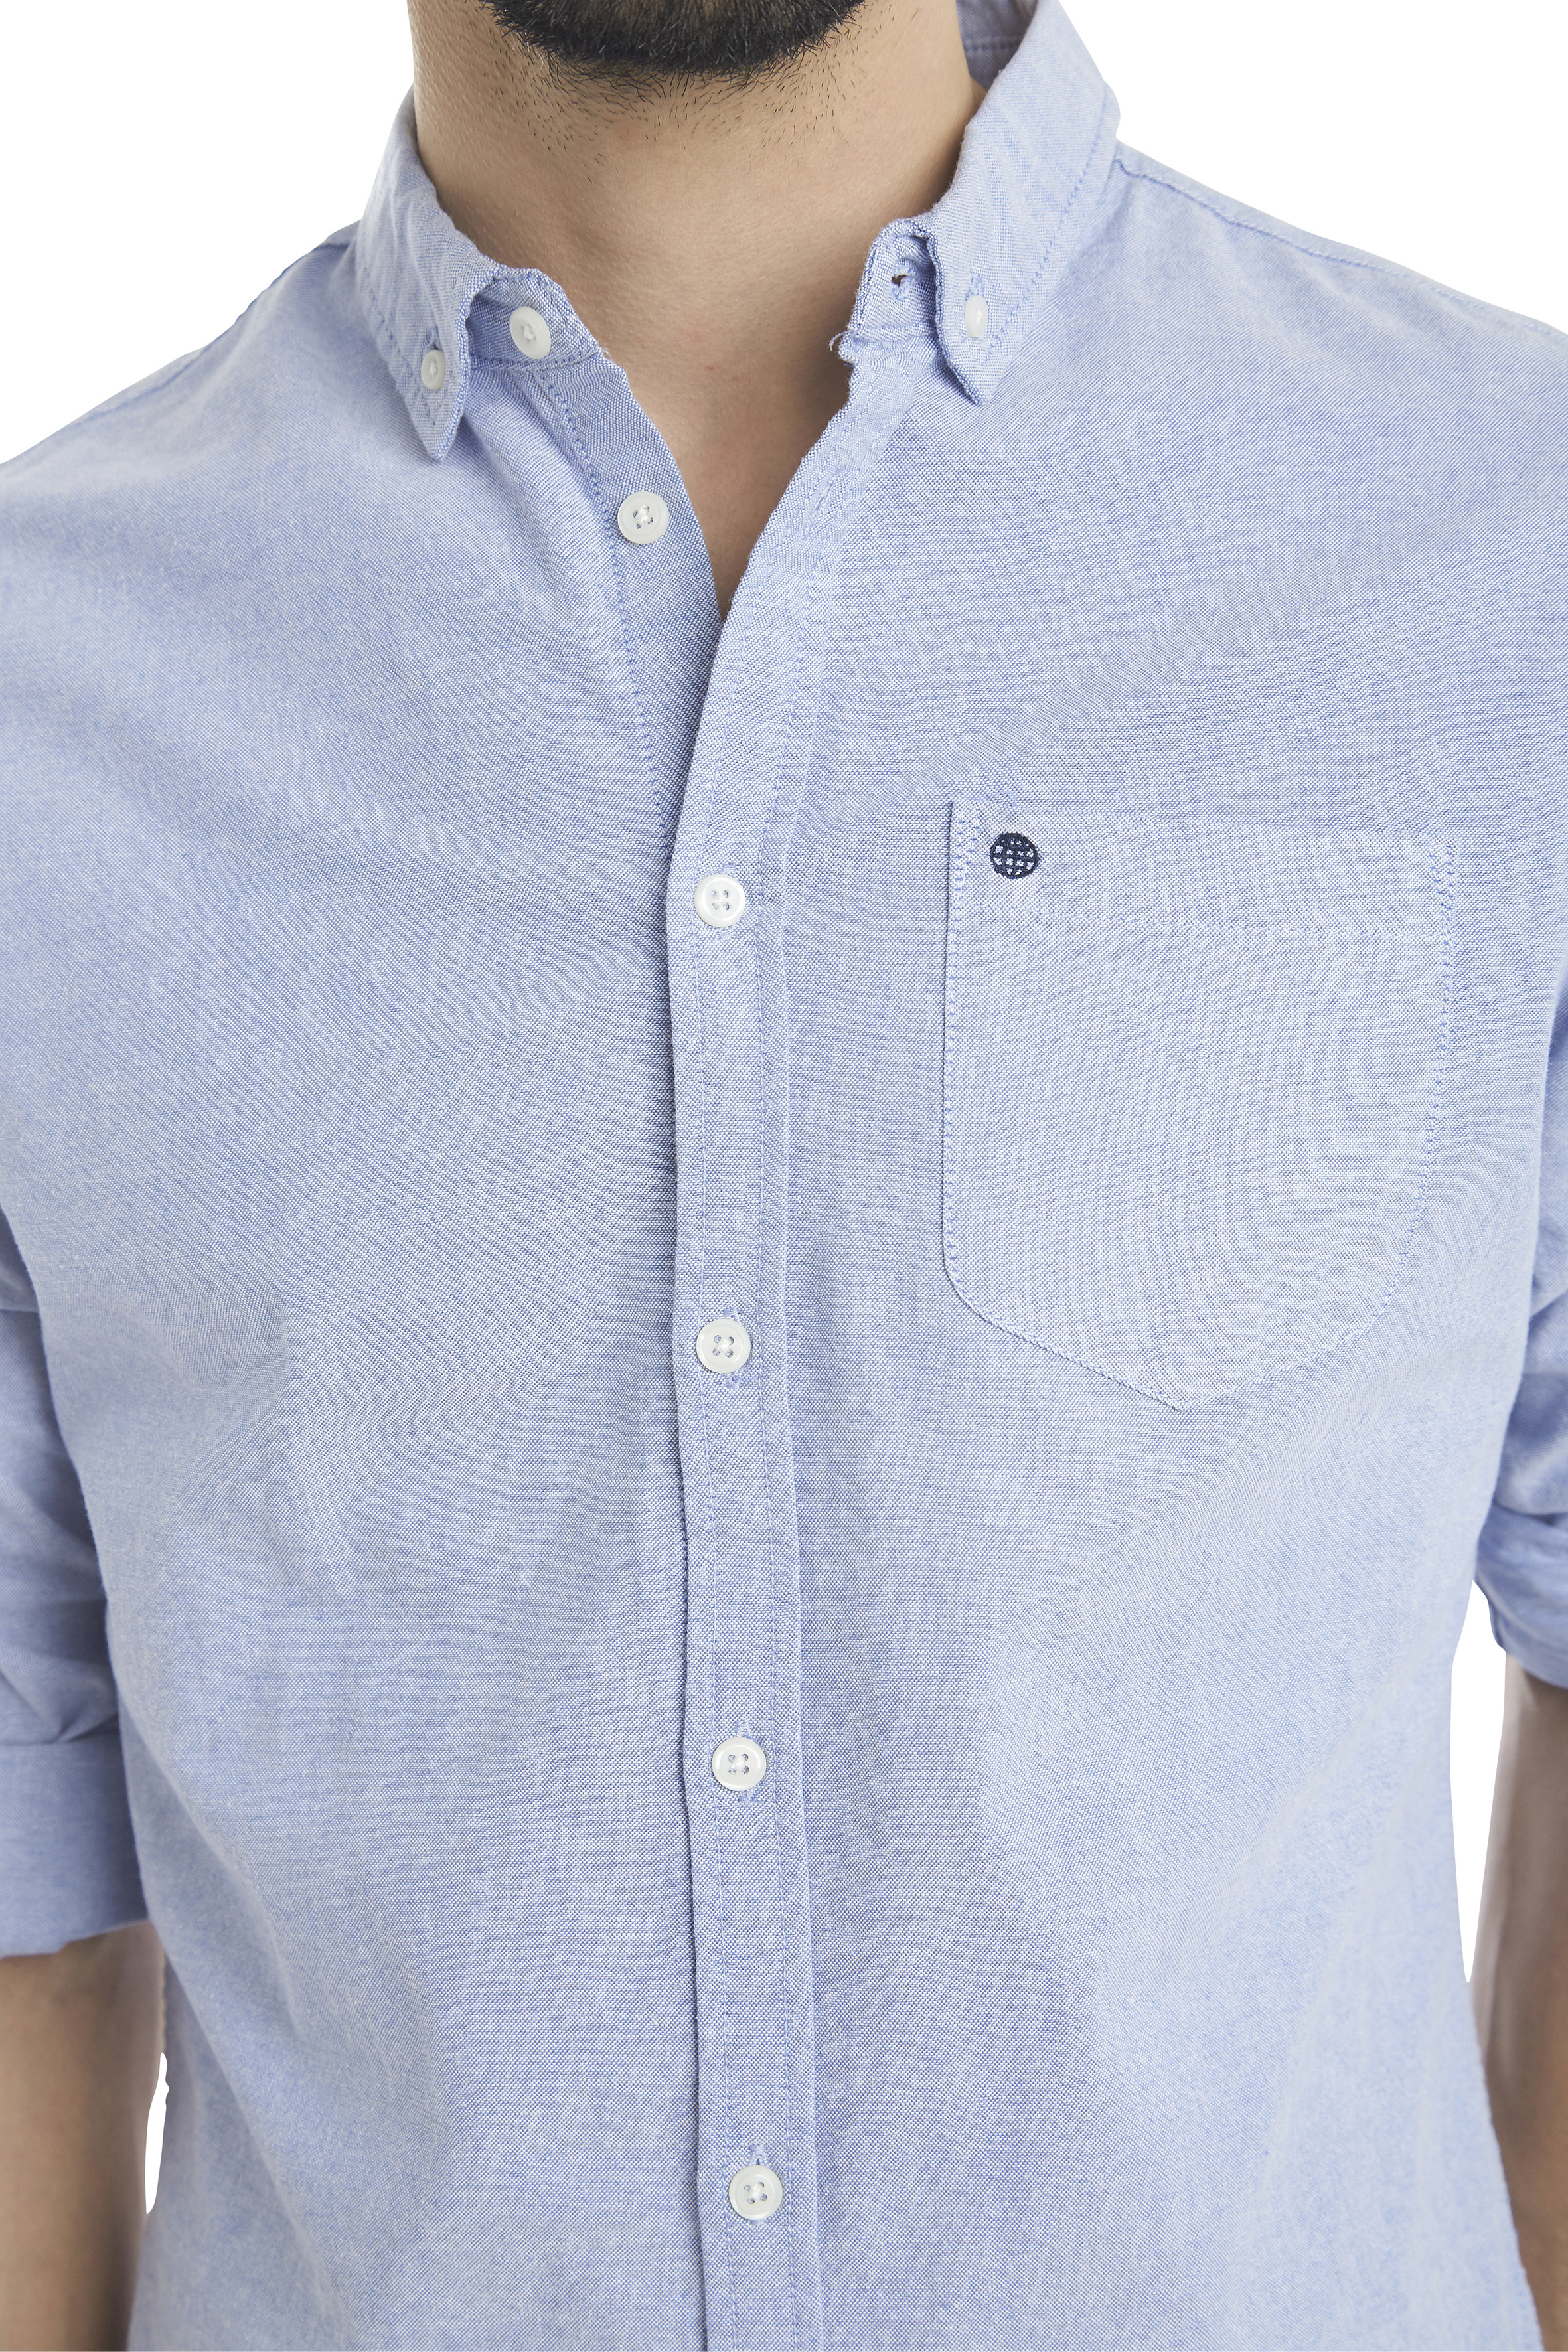 Regatta Long sleeved shirt fra Blend He – Køb Regatta Long sleeved shirt fra str. S-XXXL her